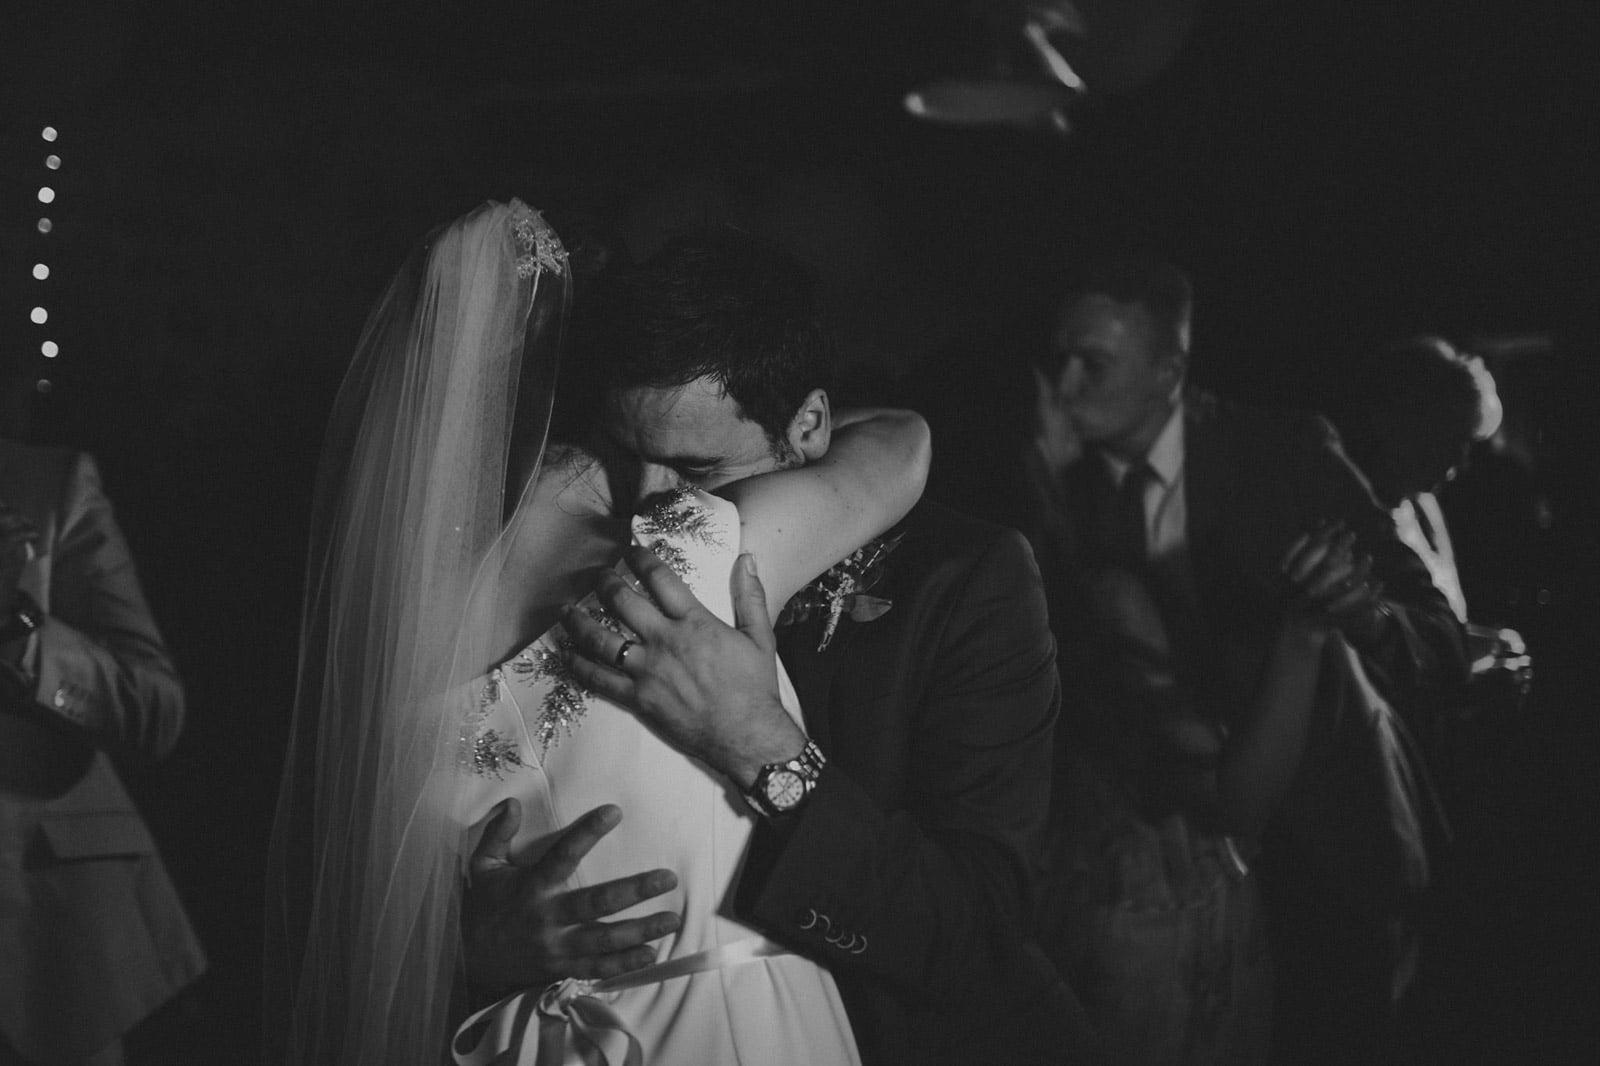 112-wedding-tuscany-san-galgano-federico-pannacci-photographer